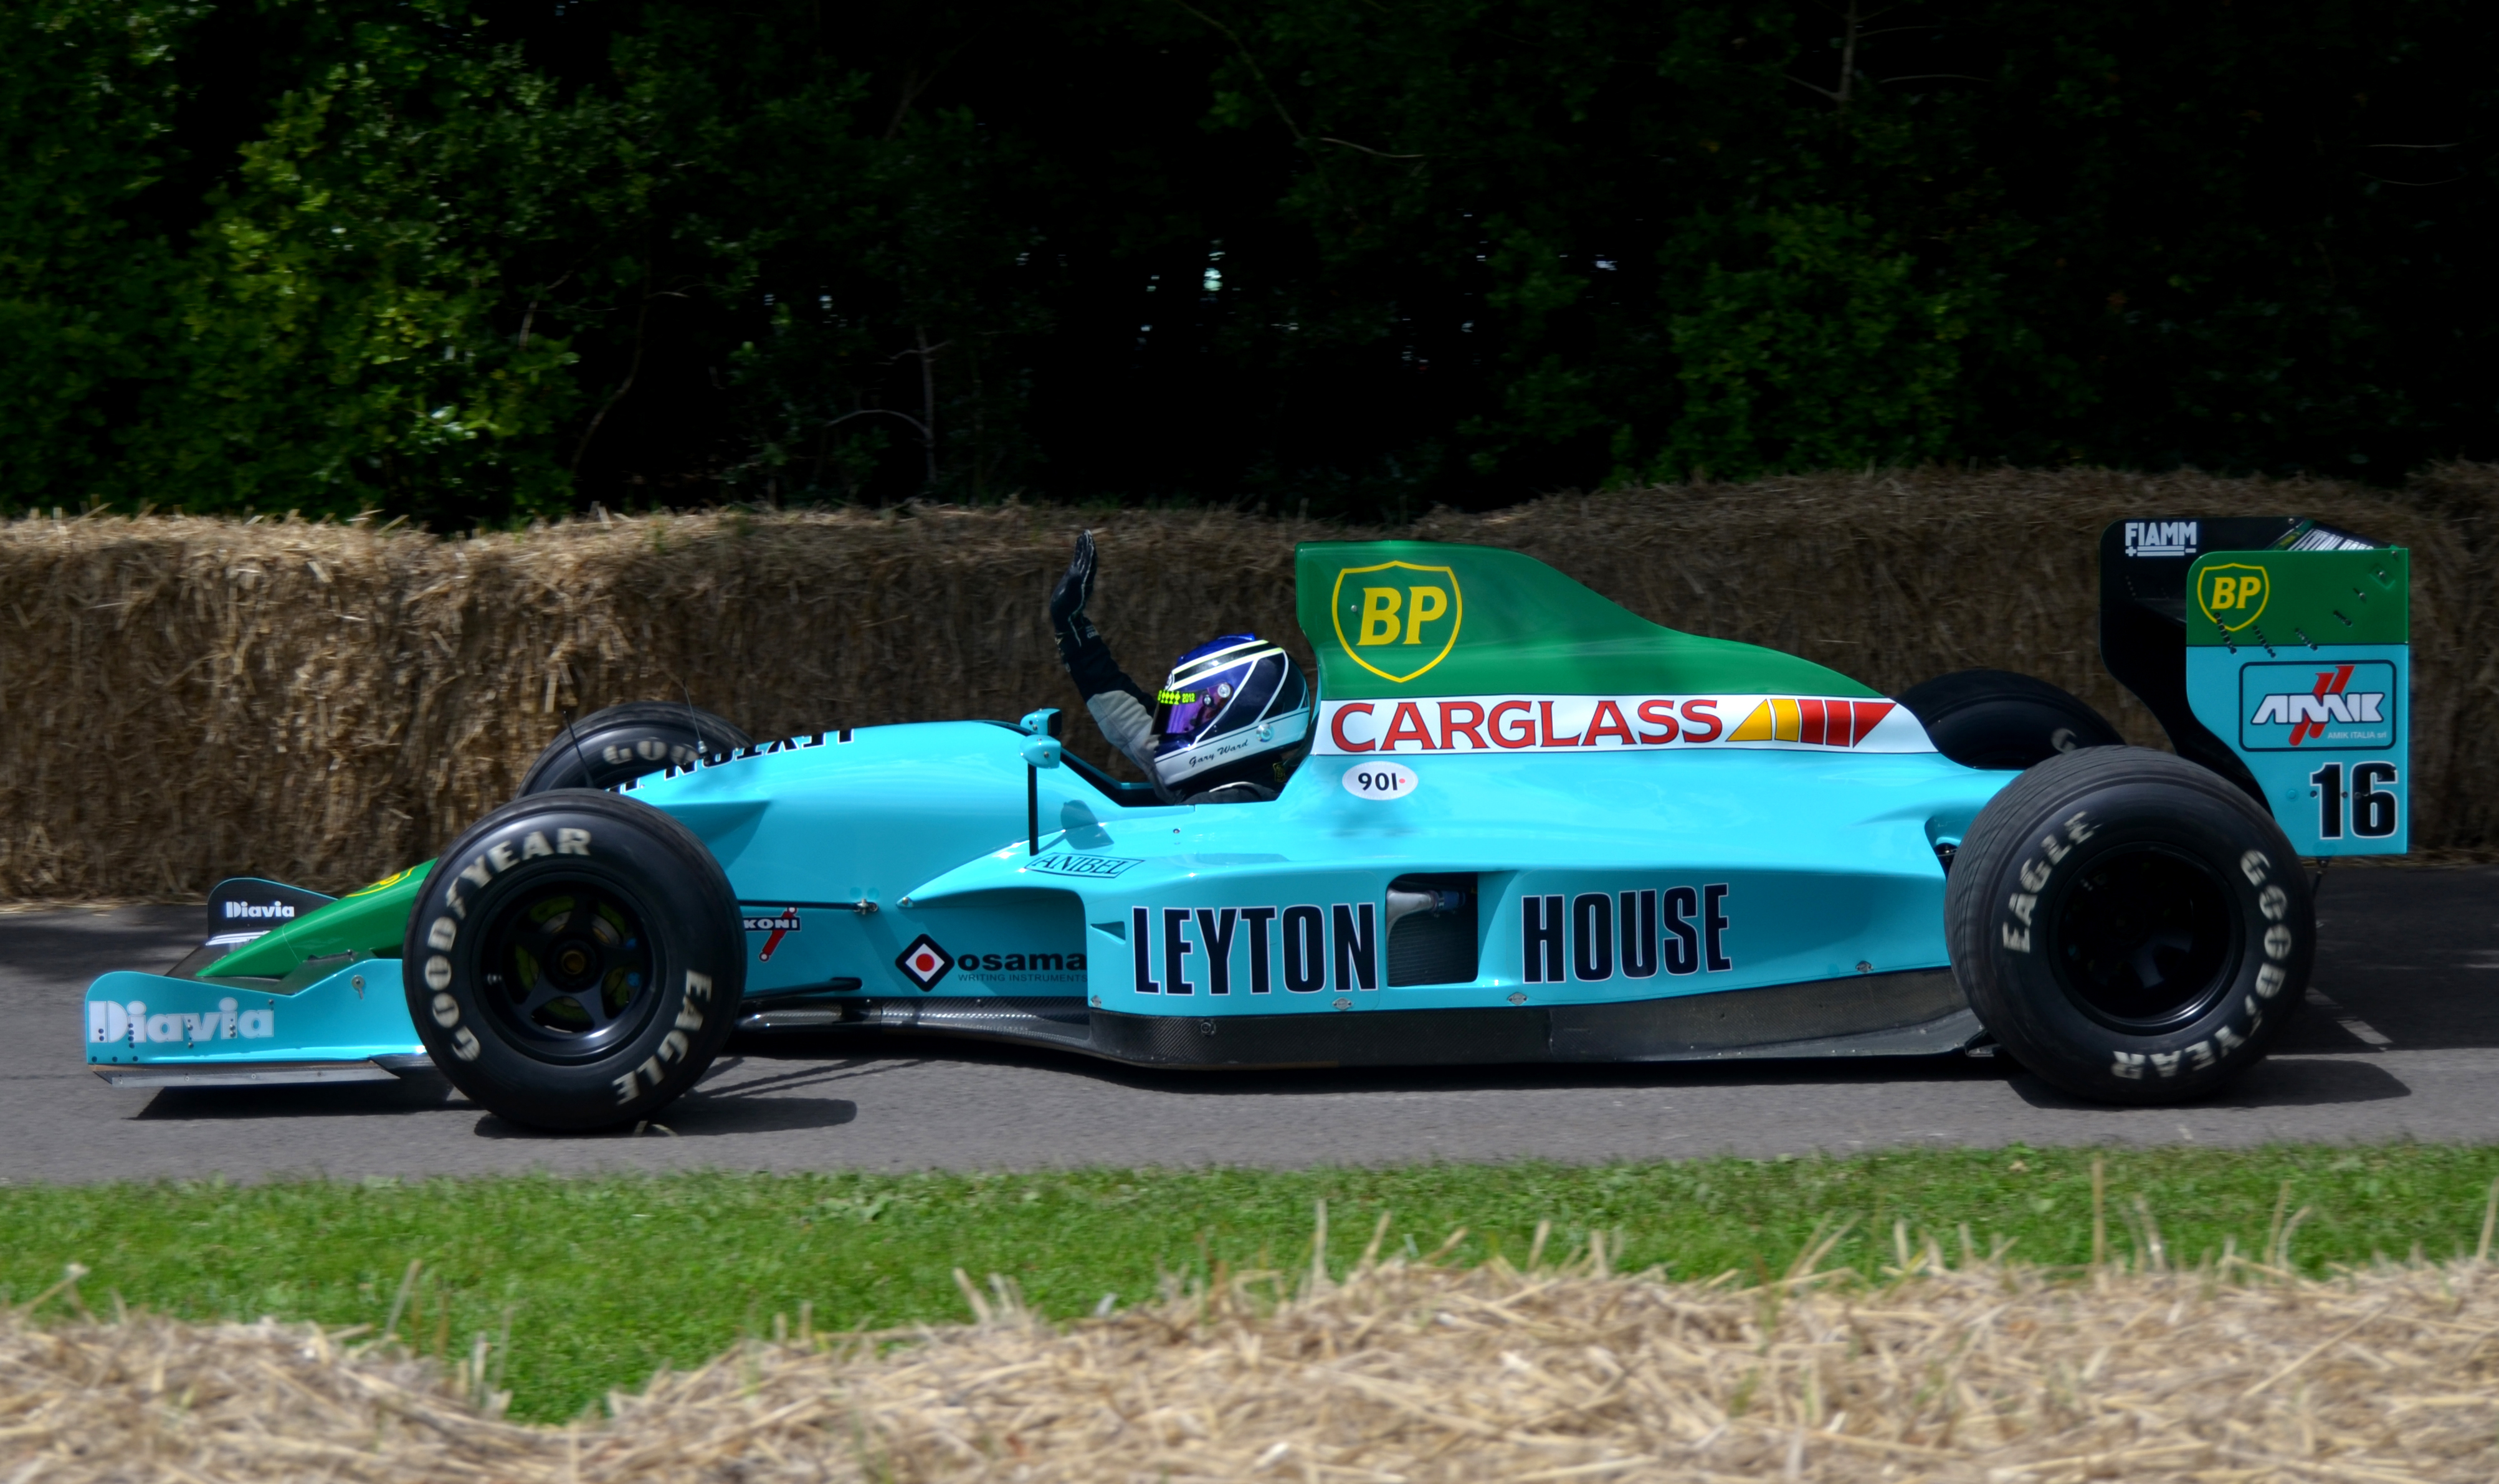 Leyton House, equipe histórica de Formula 1 de 1990 - by wipedia